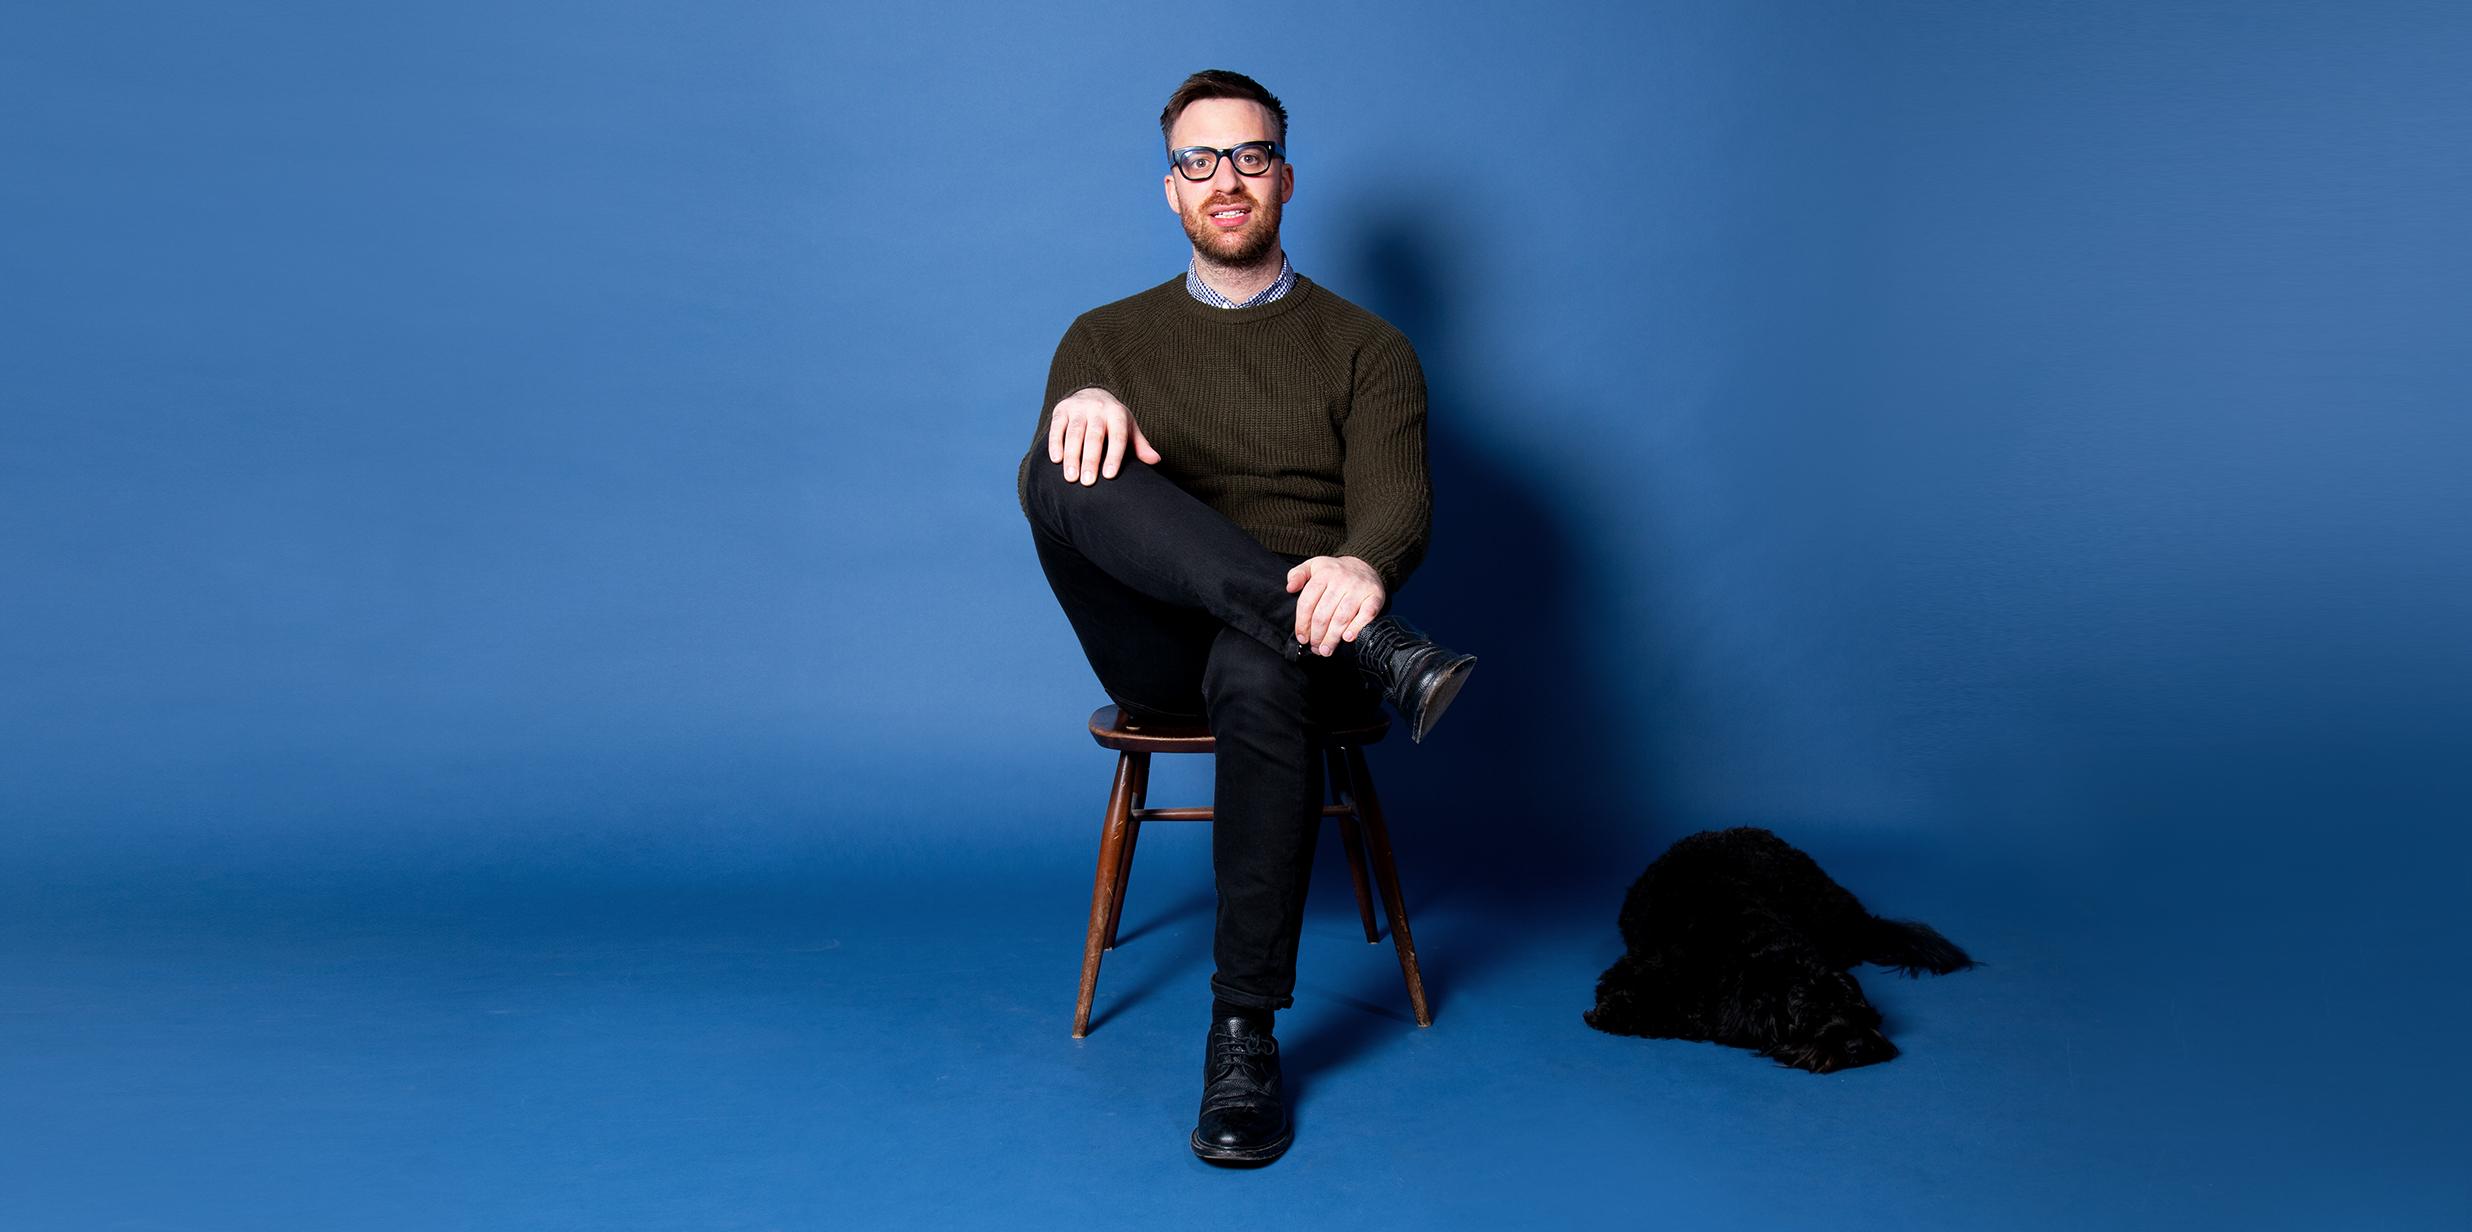 Patrick, Co-founder